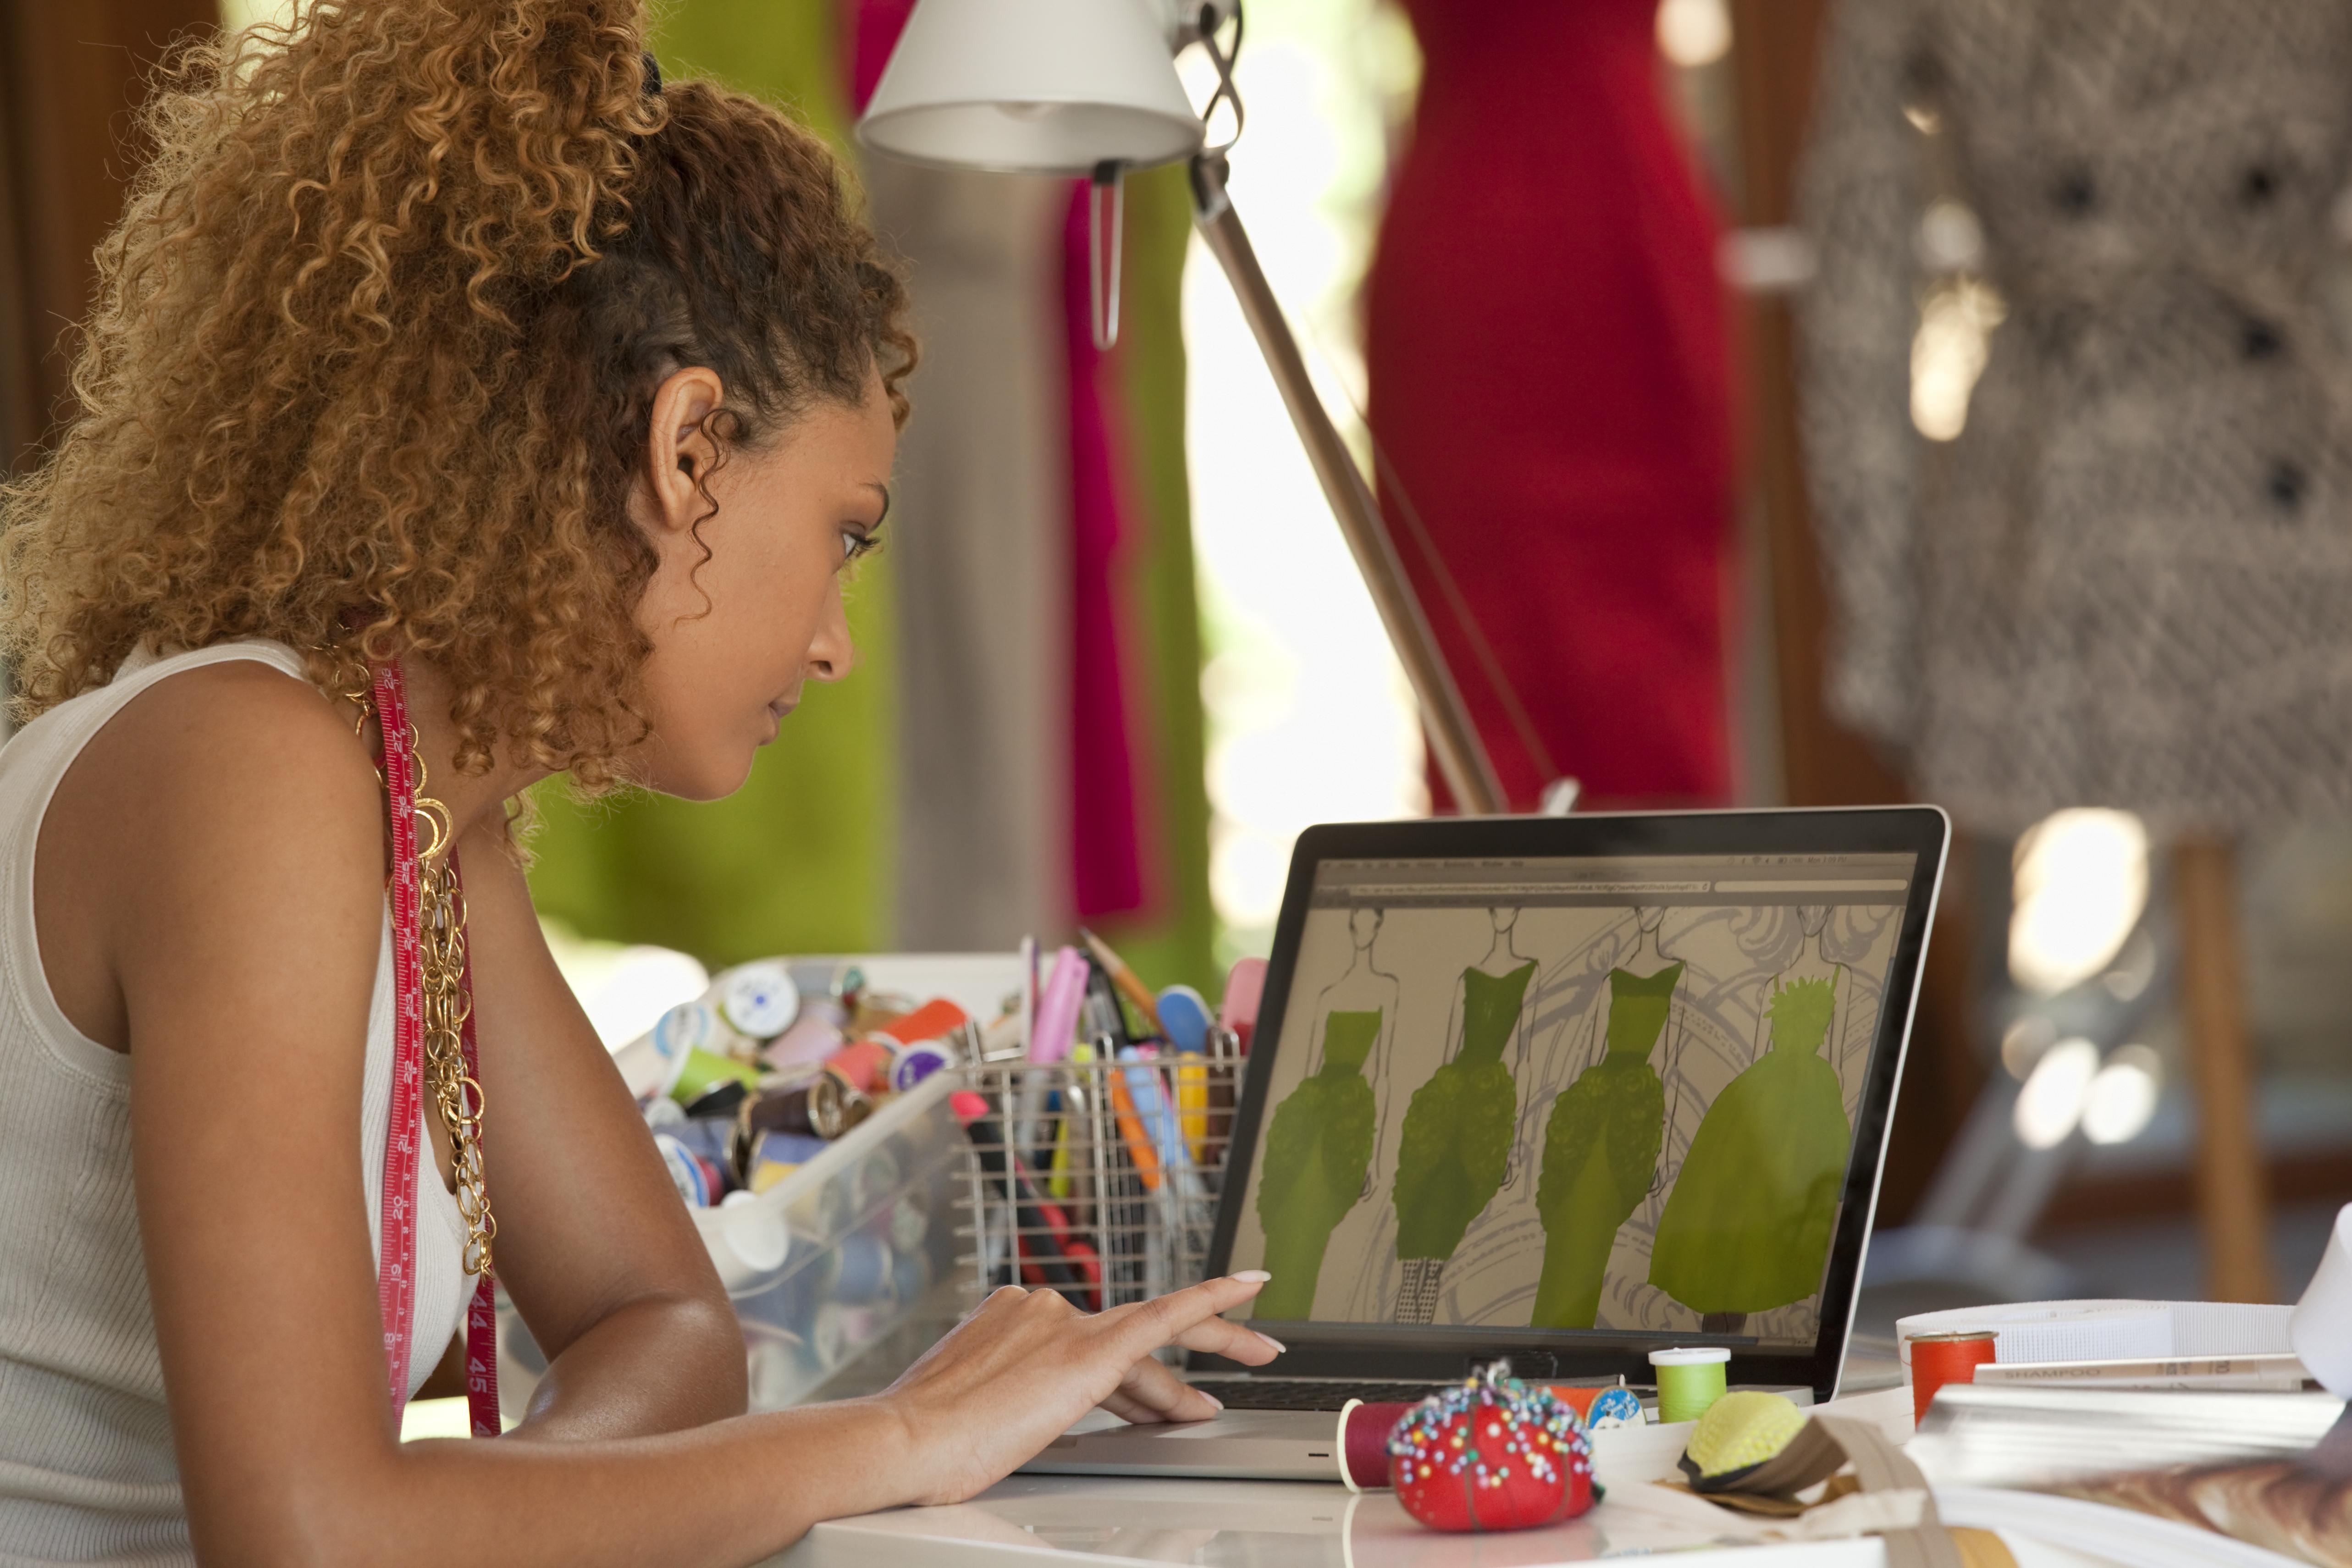 designer benetton clothing marketing workshop laptop trendy return still